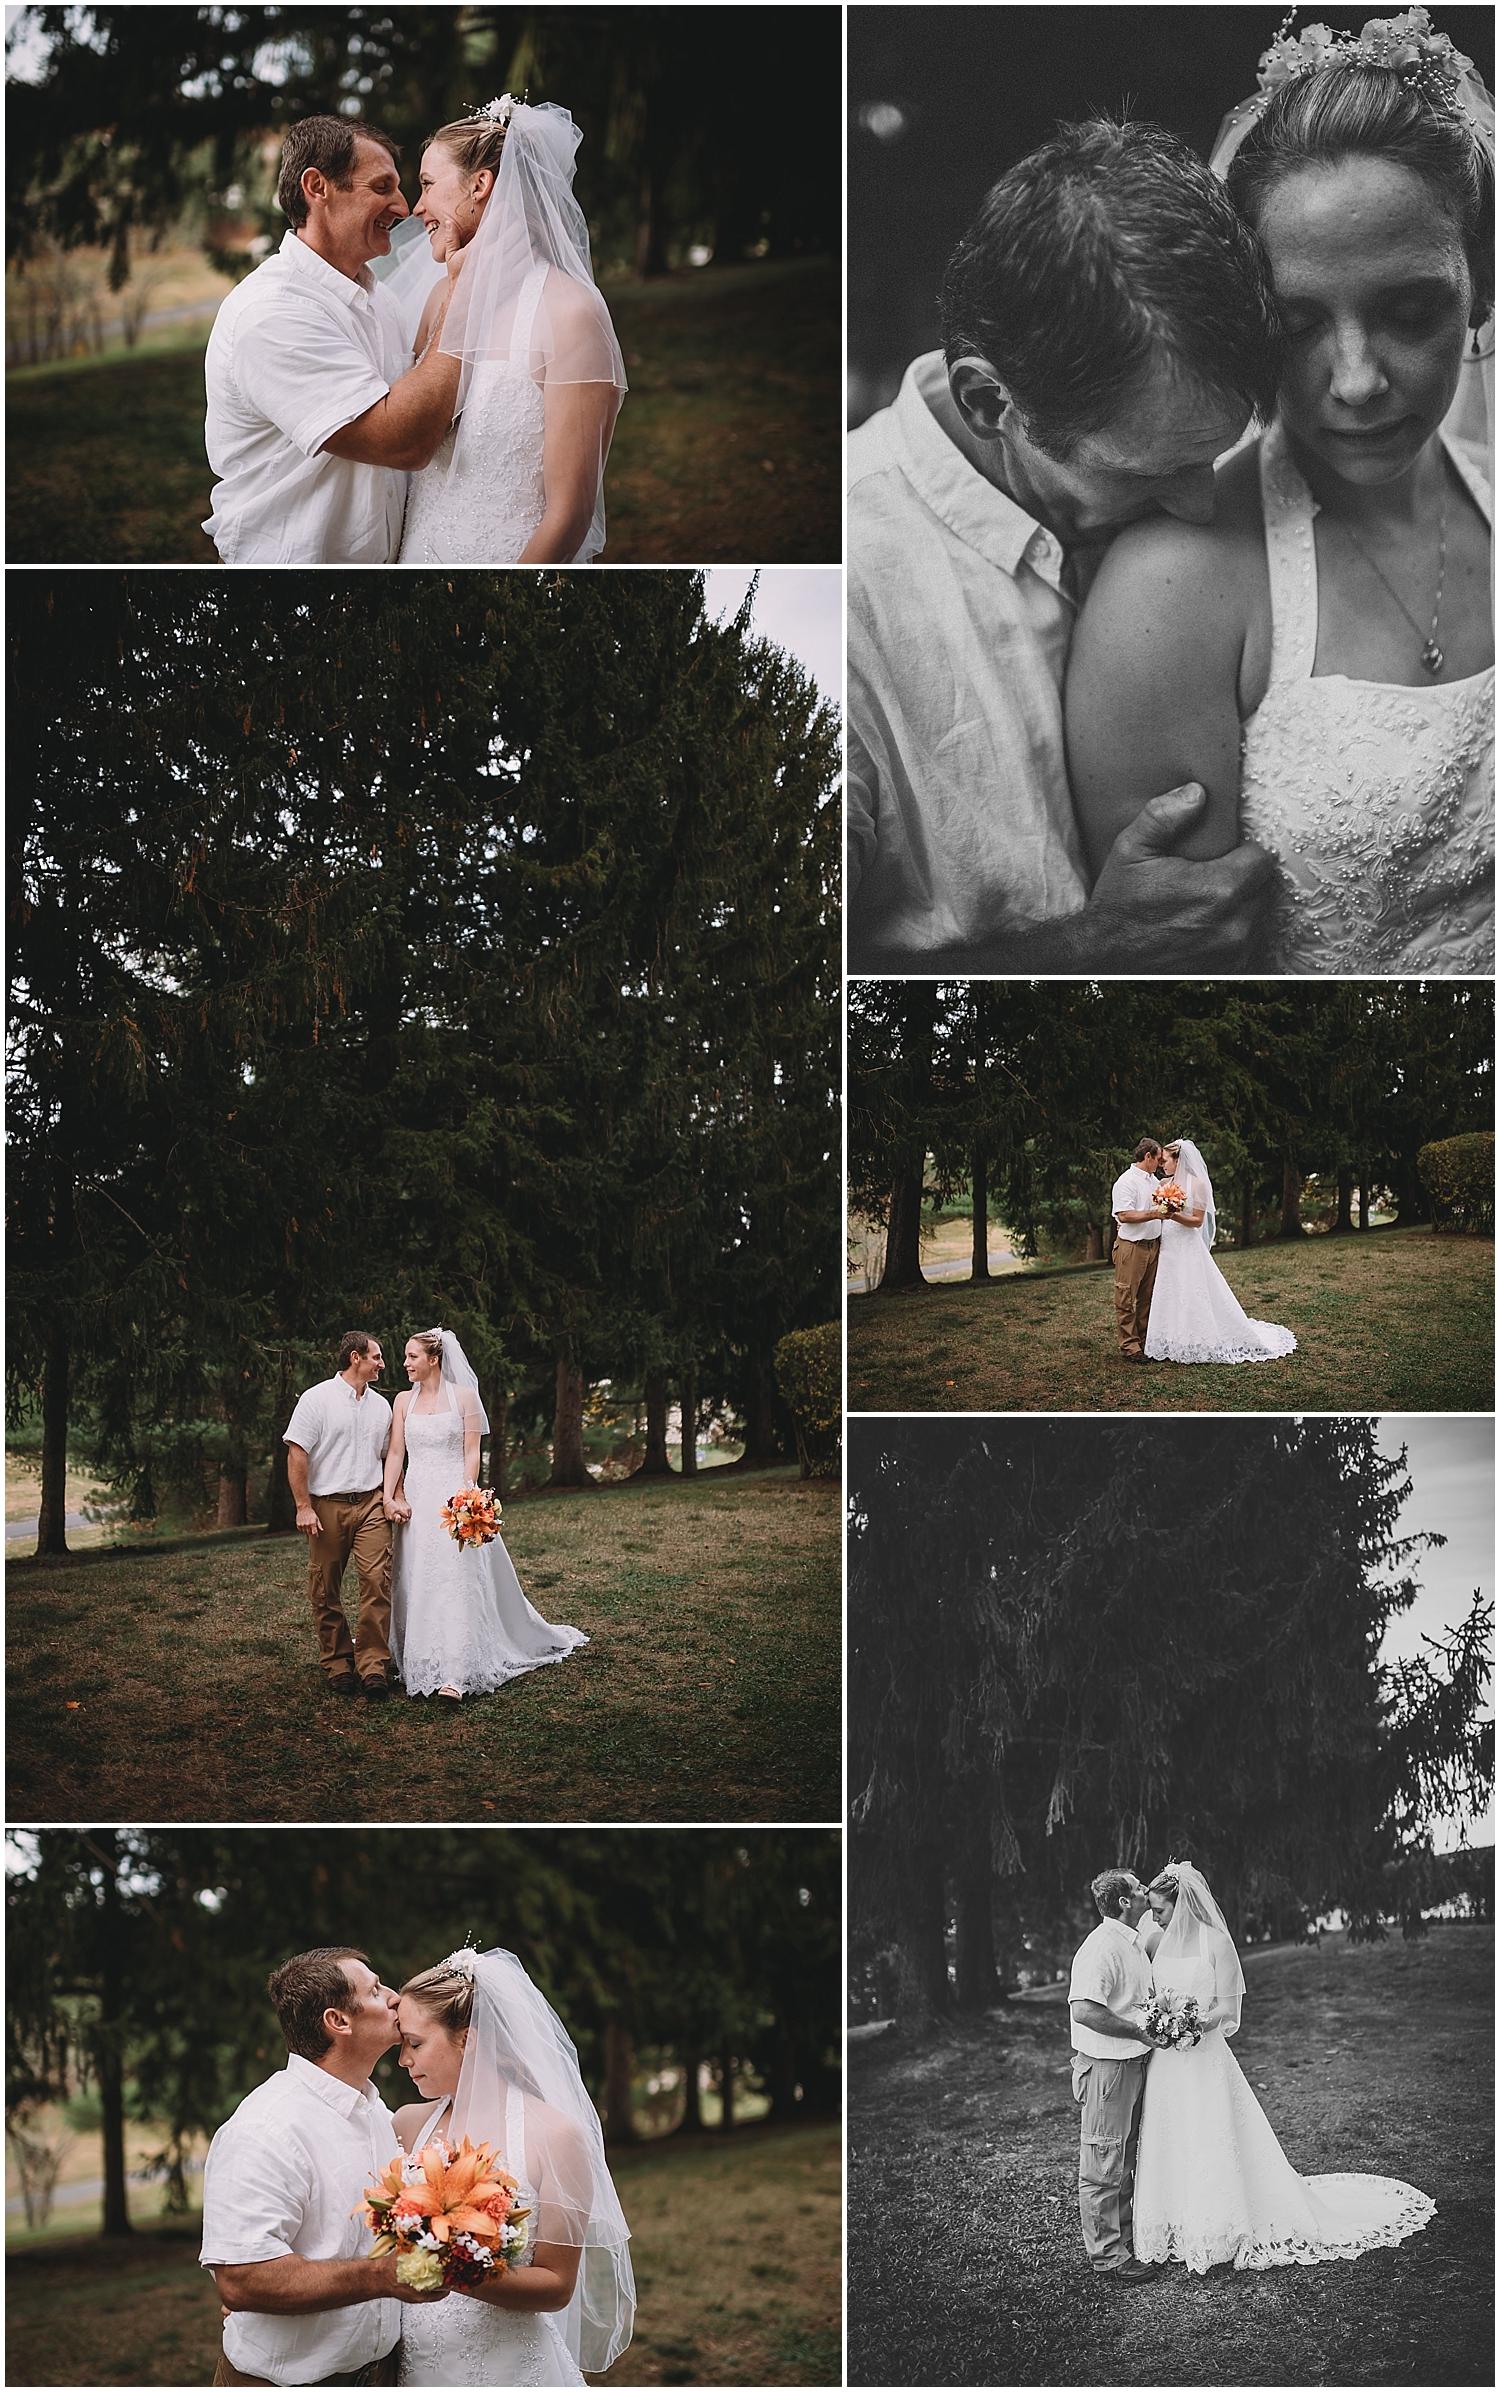 NEPA-Scranton-Dallas-wedding-engagement-photographer-in-Philadelphia-PA-Central-PA_0092.jpg